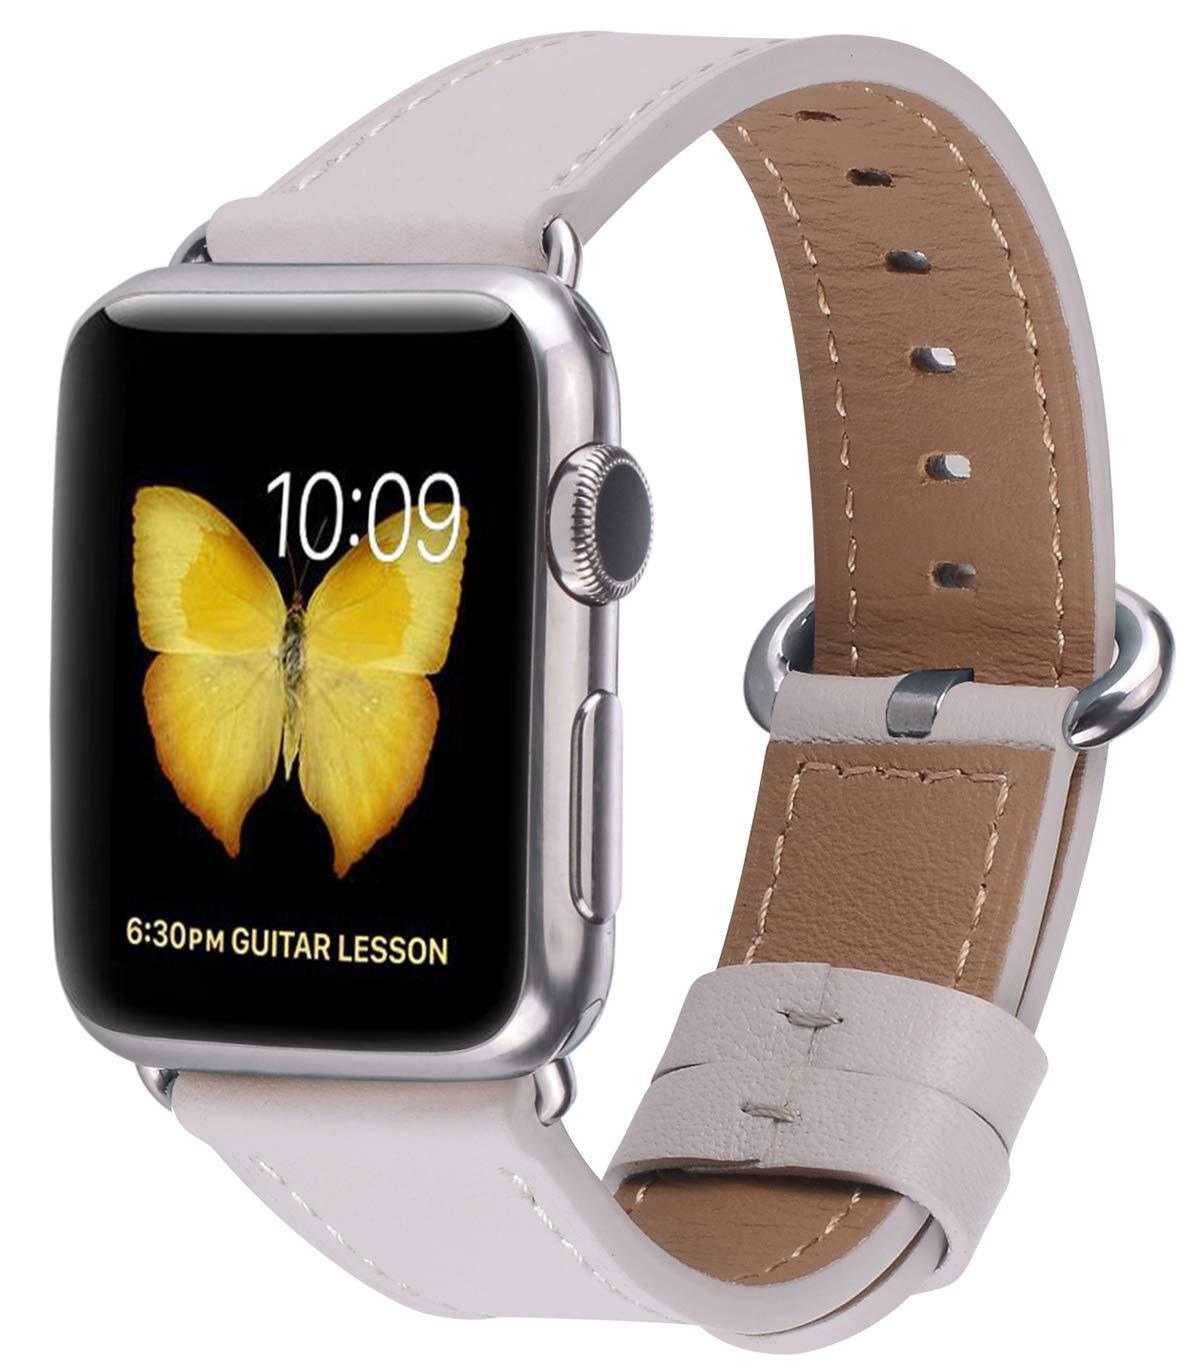 jsgjmy Apple Watchバンド38 mm 42 mmレディースメンズGenuineレザーループのiWatch Series 3 /シリーズ2 /シリーズ1 /Edition/スポーツ ストーン 38mm 40mm S/M